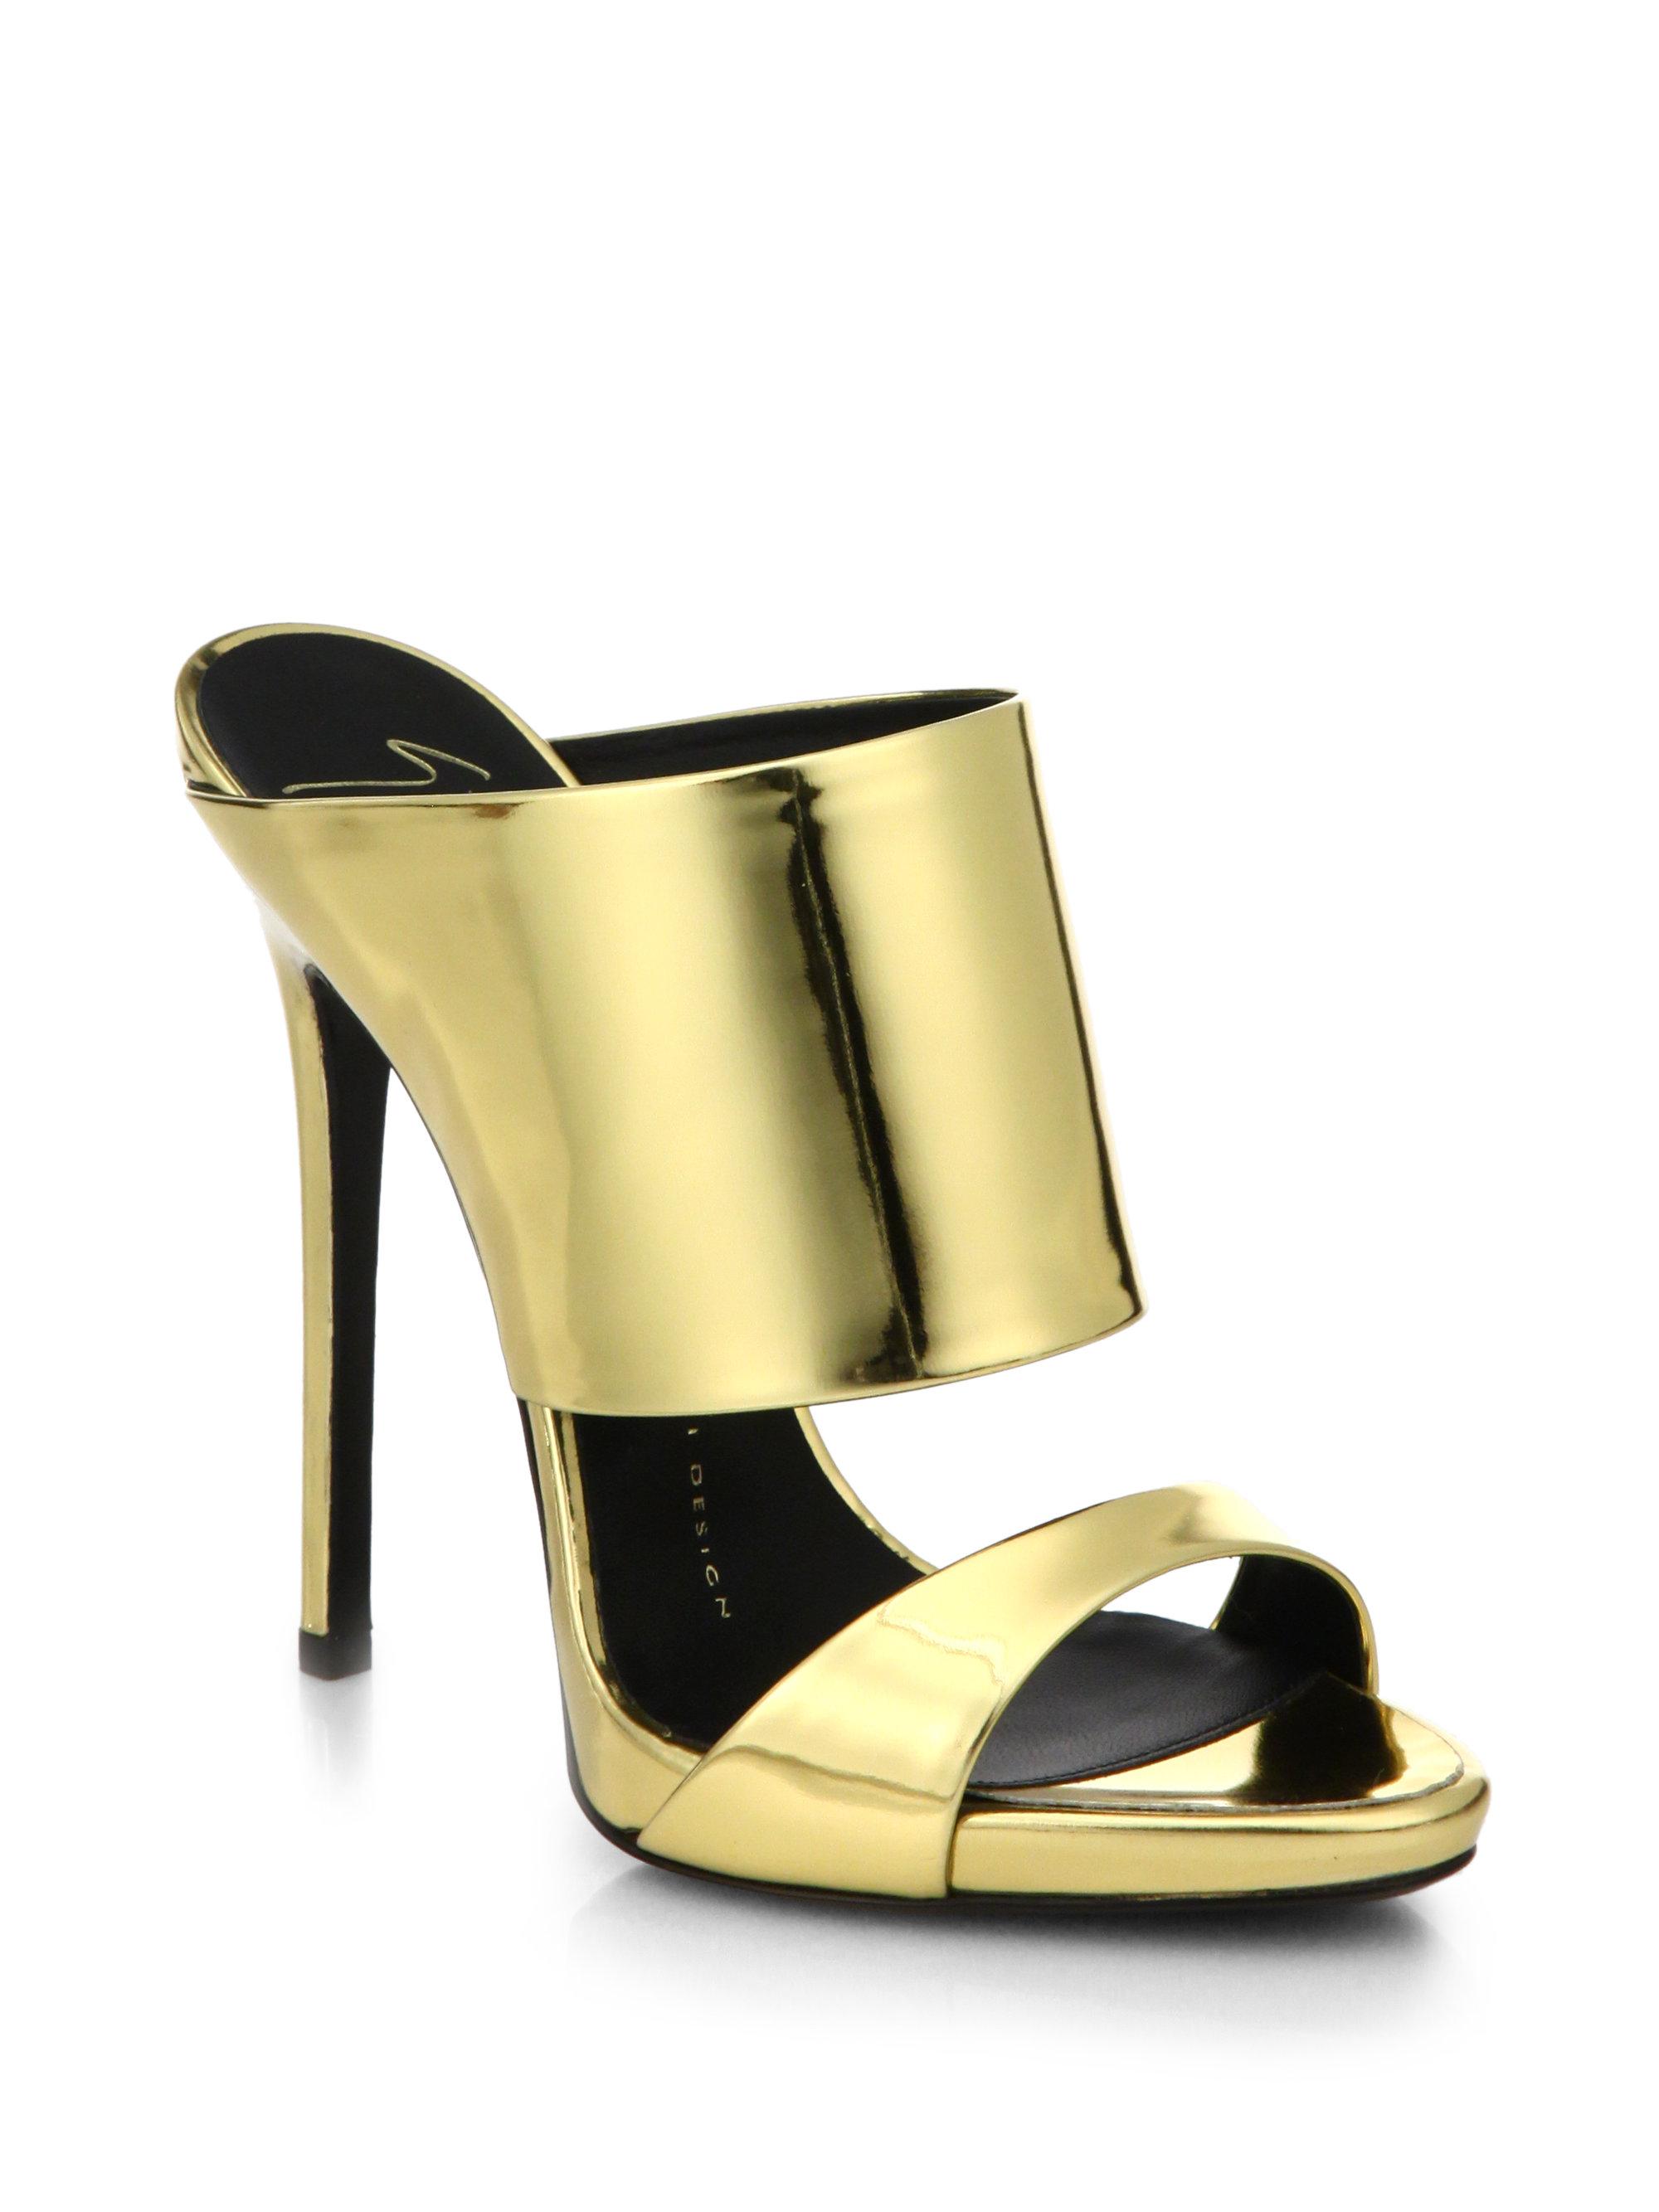 de3b4b71d4b3 Lyst - Giuseppe Zanotti Metallic Leather Mule Sandals in Metallic